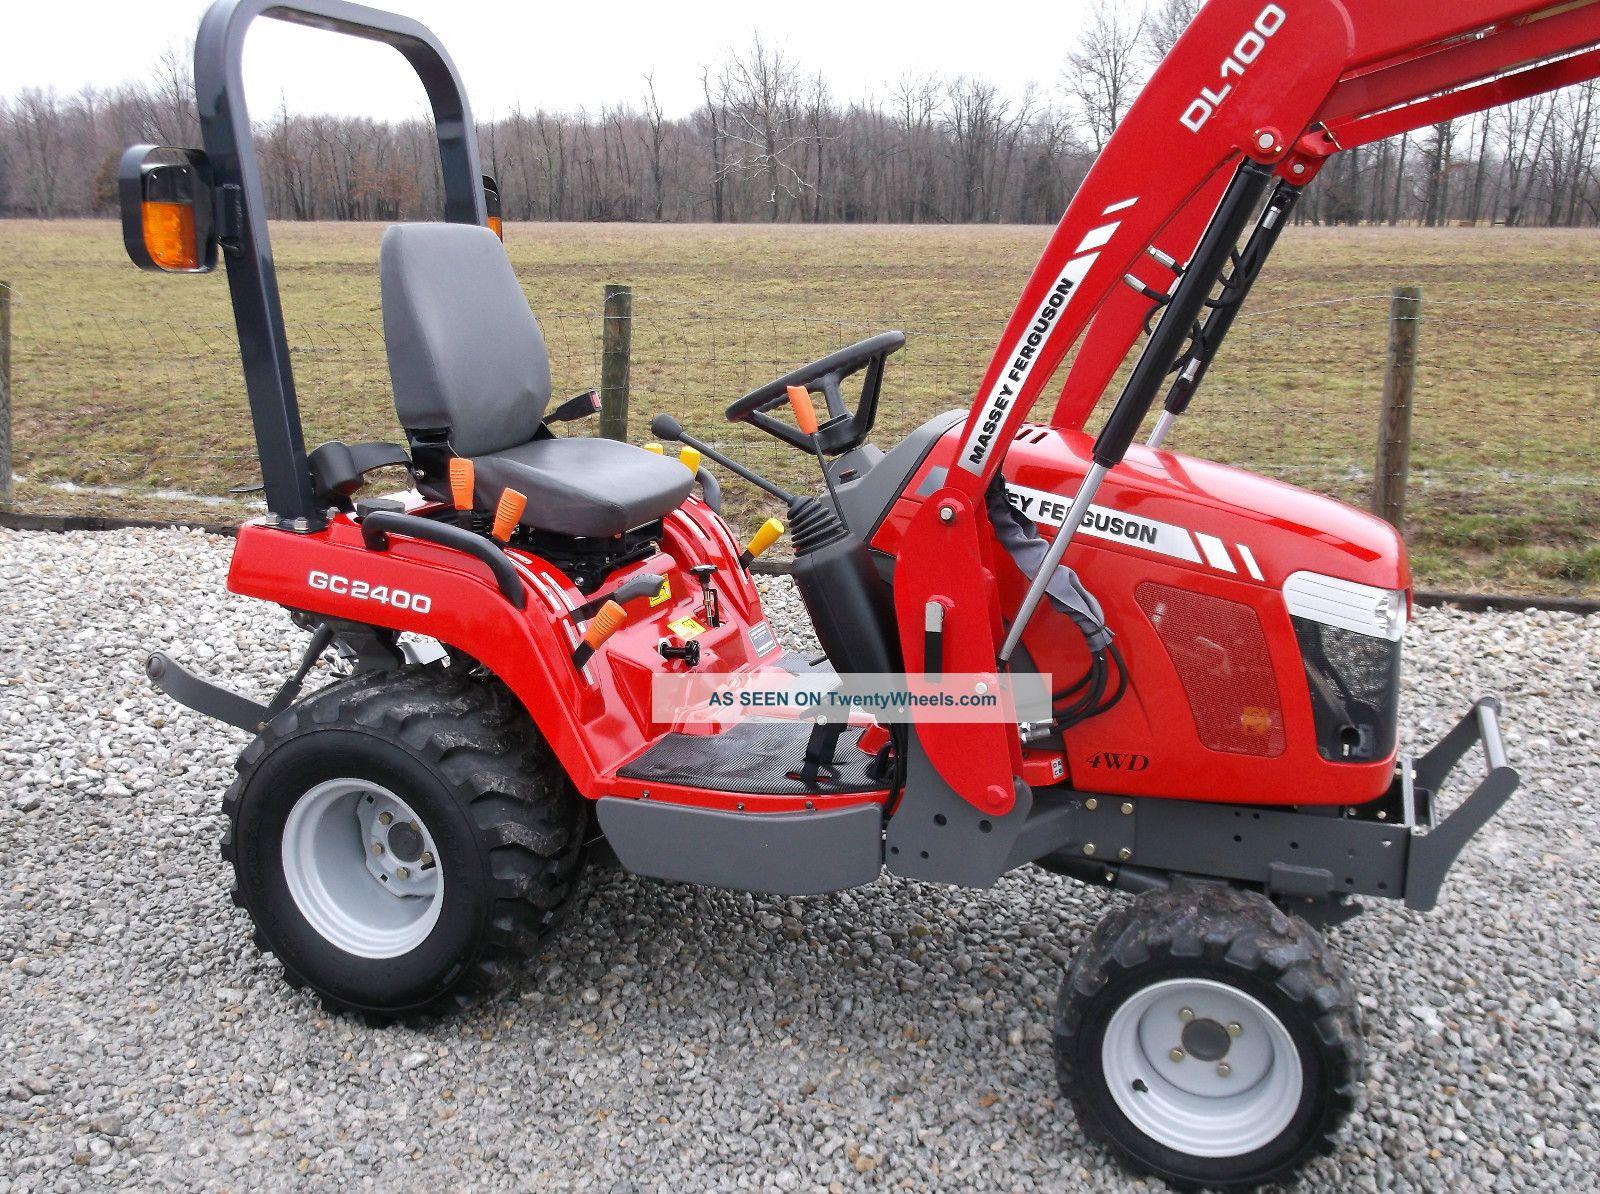 Massey Ferguson 2400 : Massey ferguson gc compact tractor front